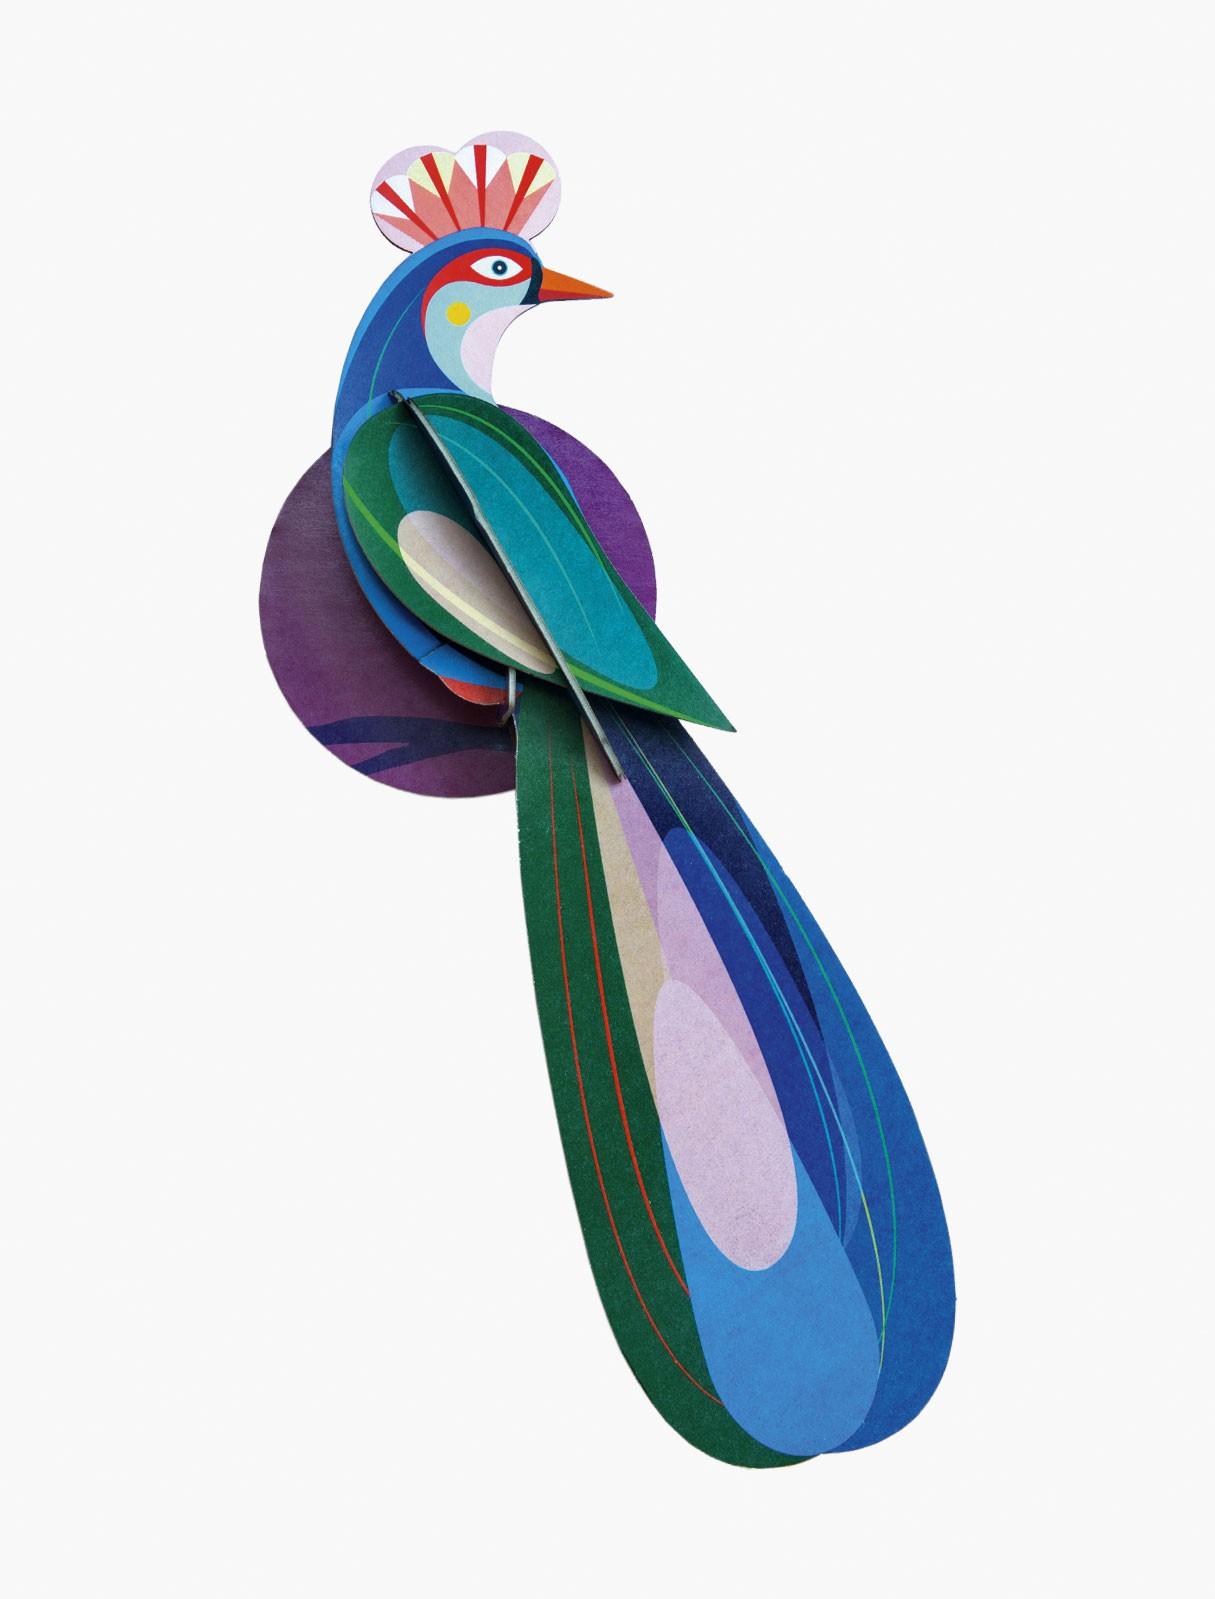 Décoration murale Totem Paradise Bird, Banda - Studio Roof